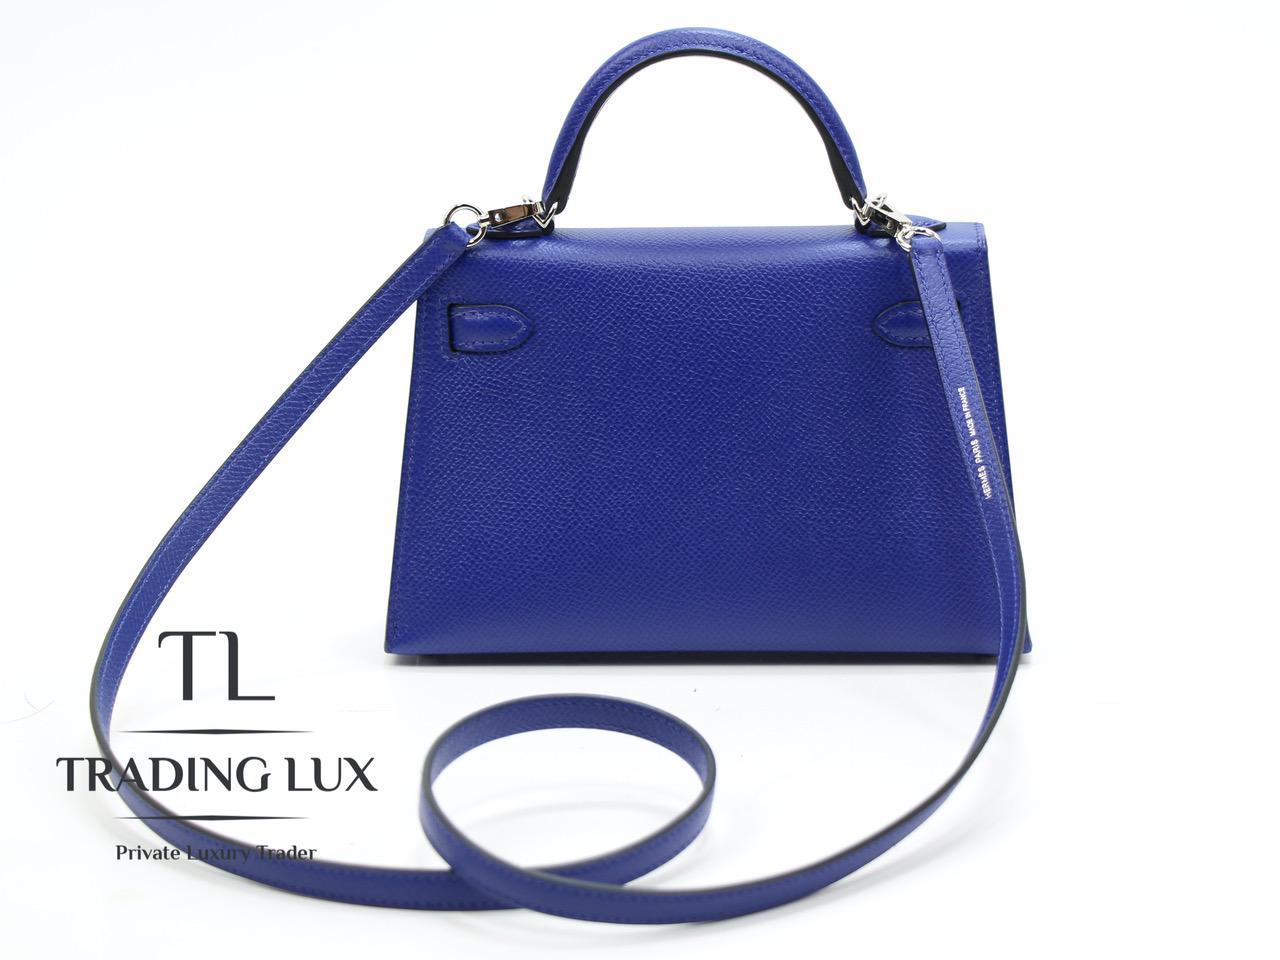 ermès-Mini-Kelly-20-Blue-Electric-7-1